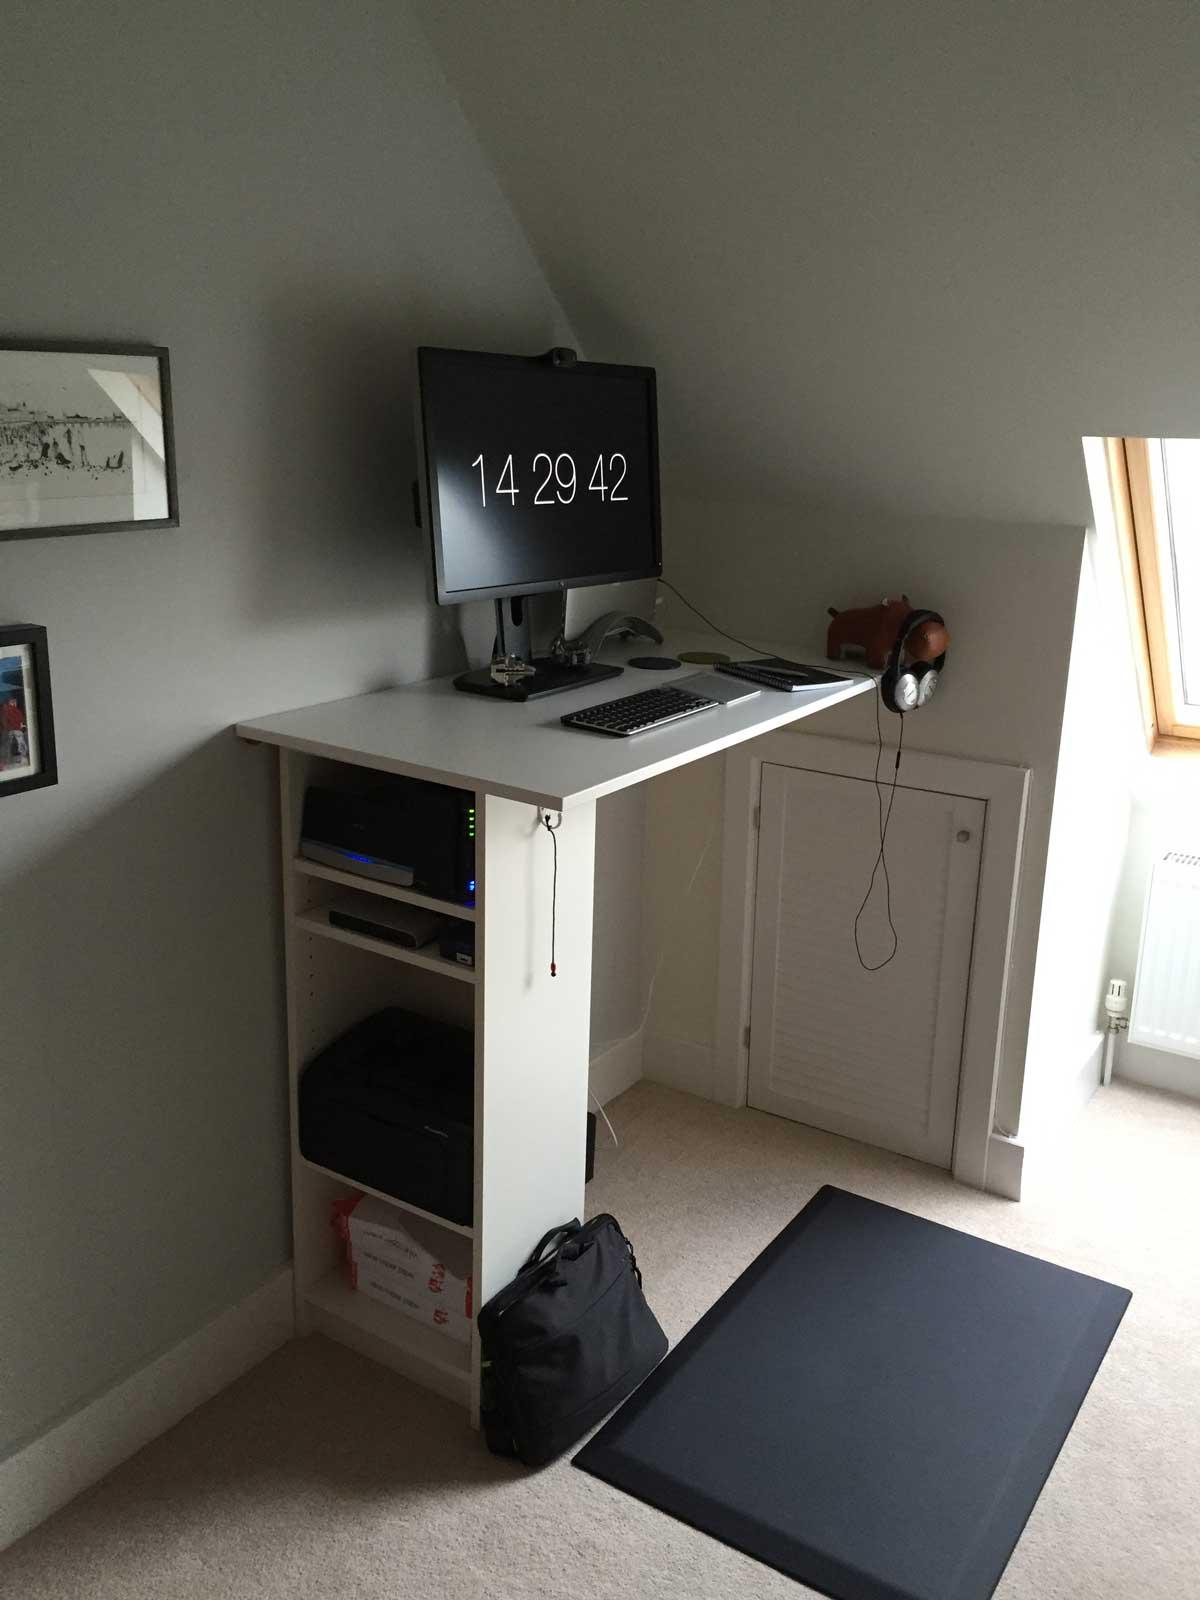 Andy Croll's standing desk setup